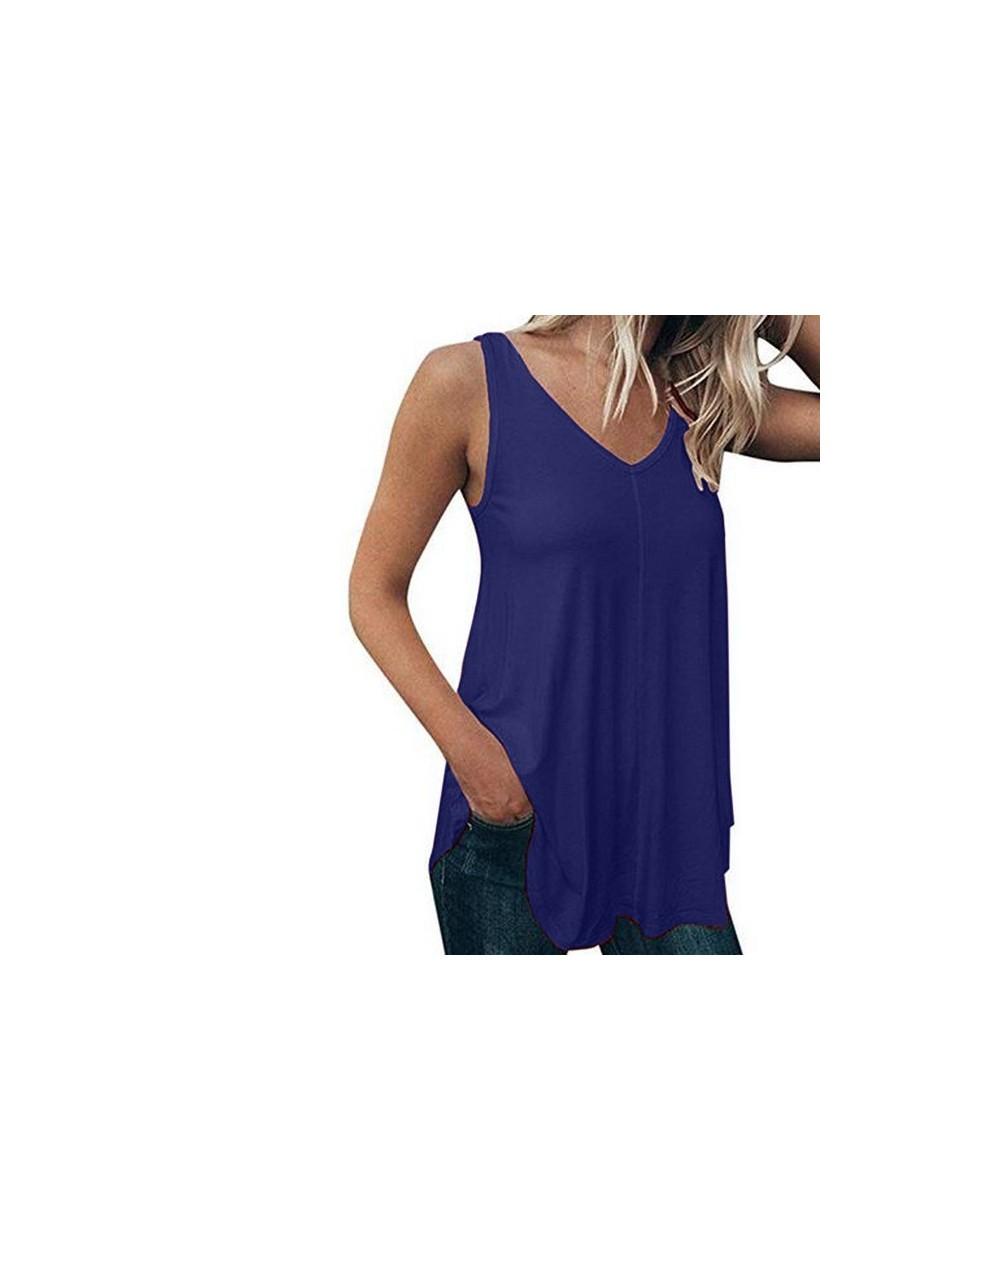 Plus Size 5XL Summer Fashion Casual Pure Color Tops Camis Vest Tee Top Female Women's Sleeveless Shirt Blusas Femininas Clot...